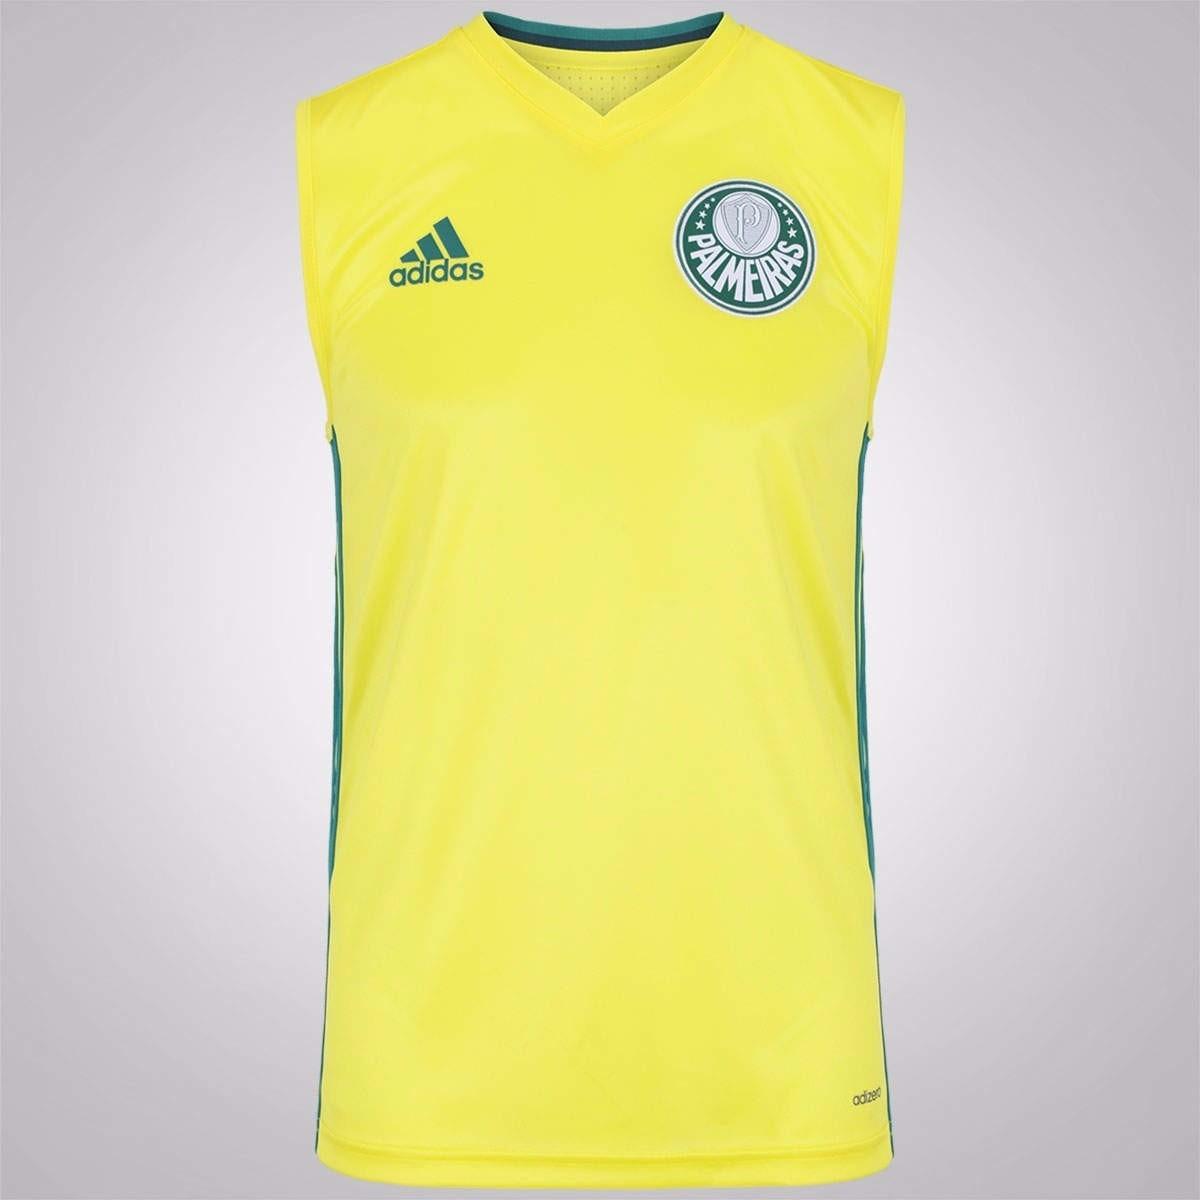 4b3f0b4be277f Camisa Regata Palmeiras - adidas